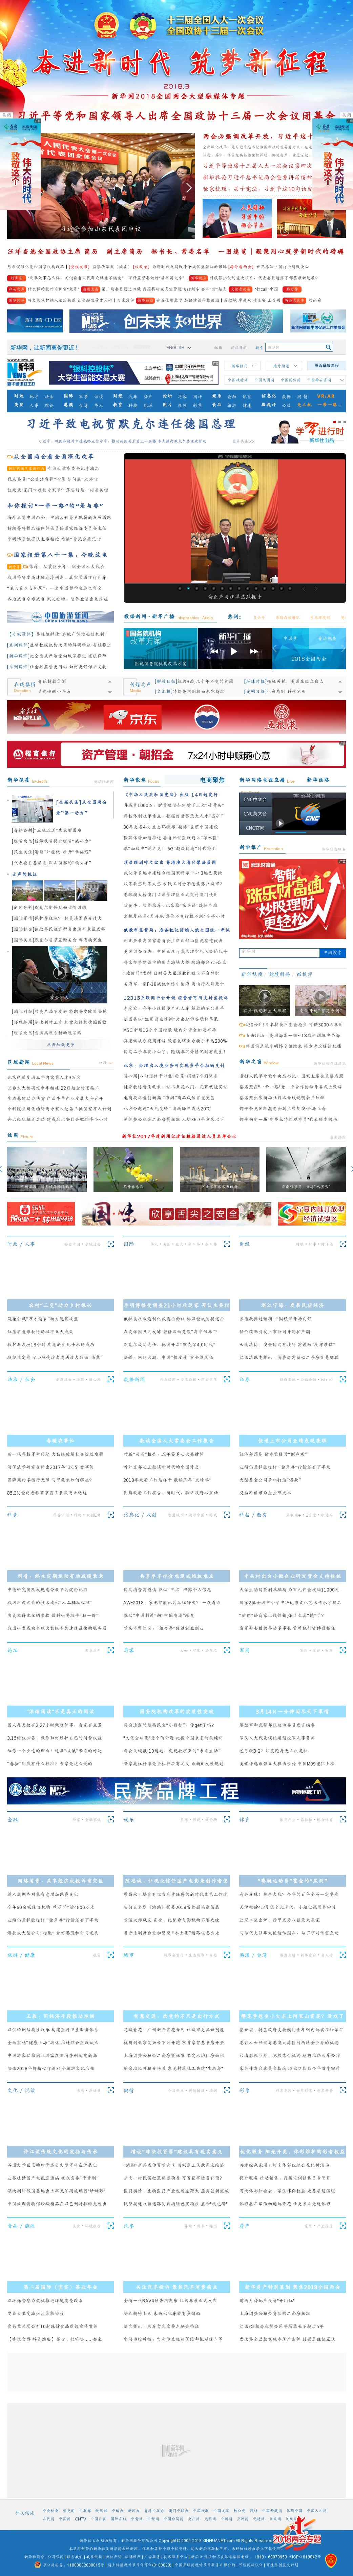 Xinhua at Thursday March 15, 2018, 7:13 a.m. UTC